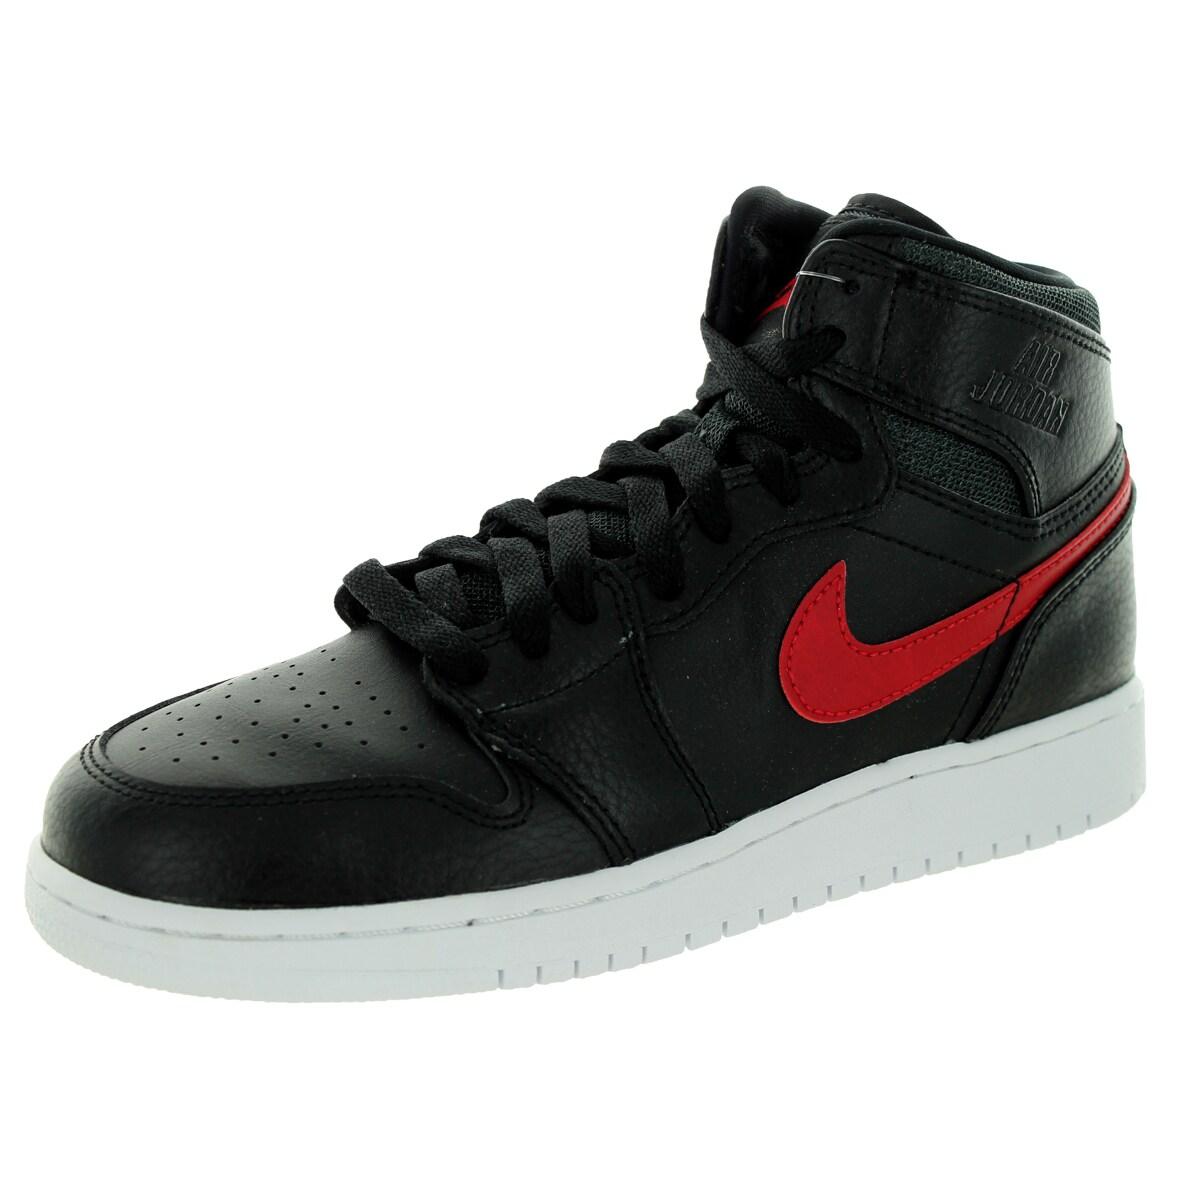 new concept 46708 73f52 Shop Nike Jordan Kid s Air Jordan 1 Retro High Bg Black Gym Red Black White  Basketball Shoe - Free Shipping Today - Overstock - 12322188